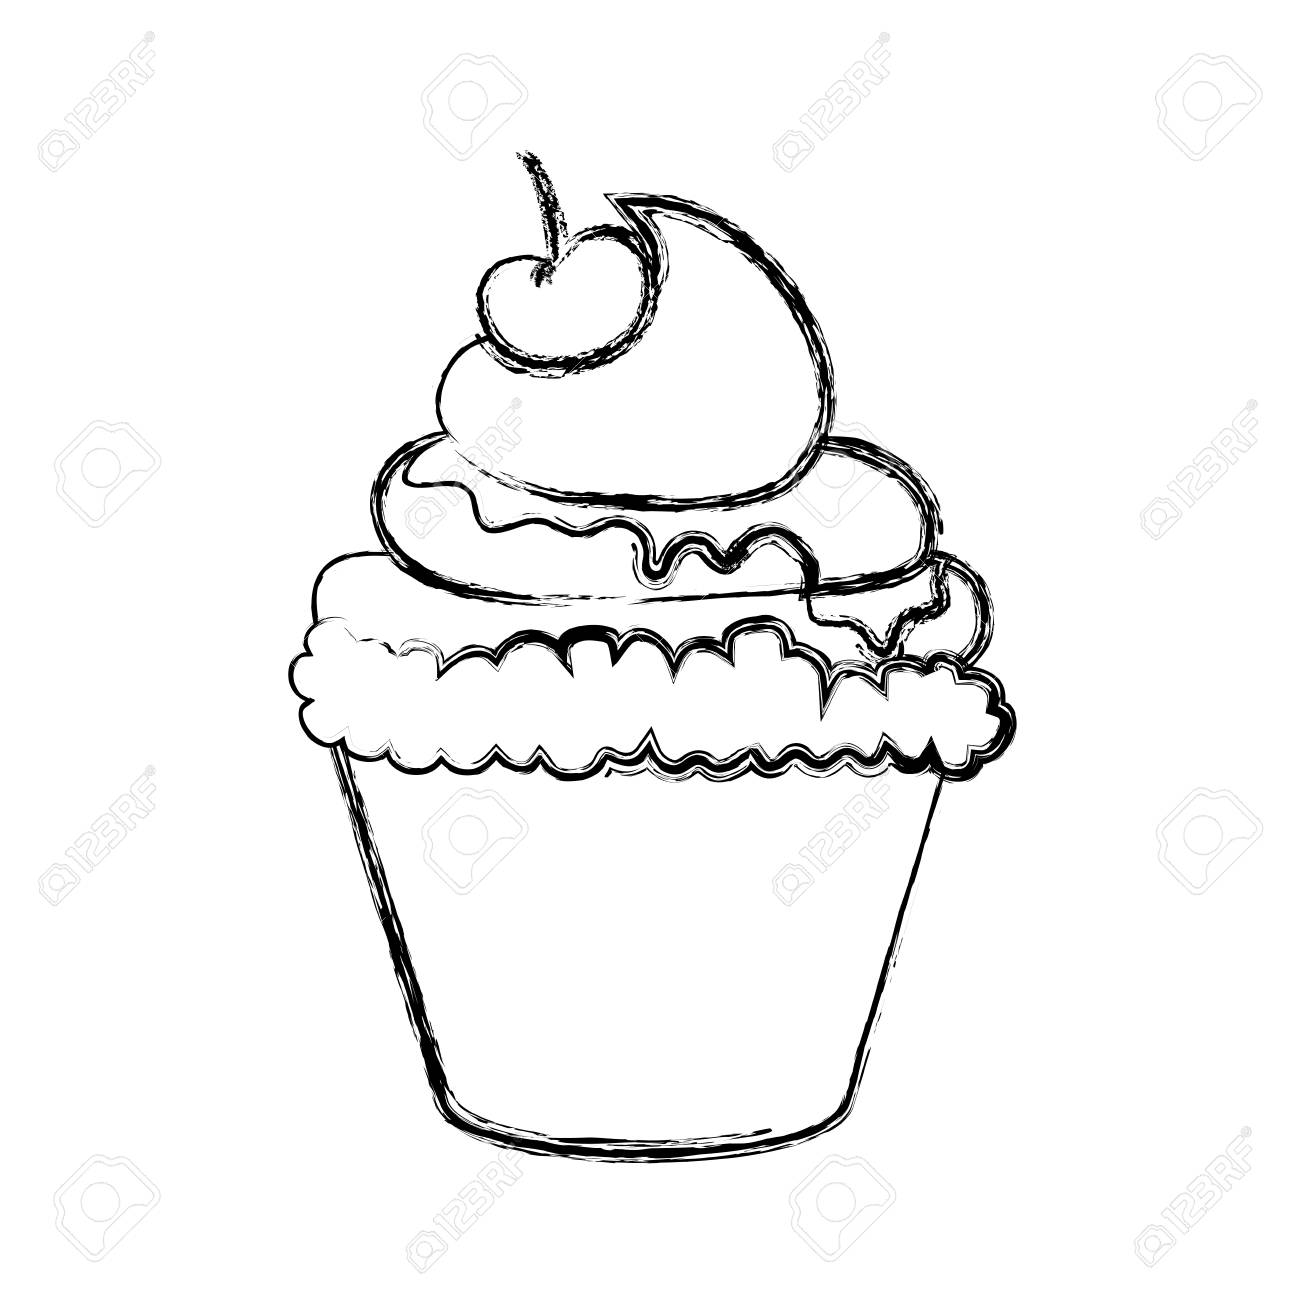 Desserts Clipart Gambar Desserts Gambar Transparent FREE